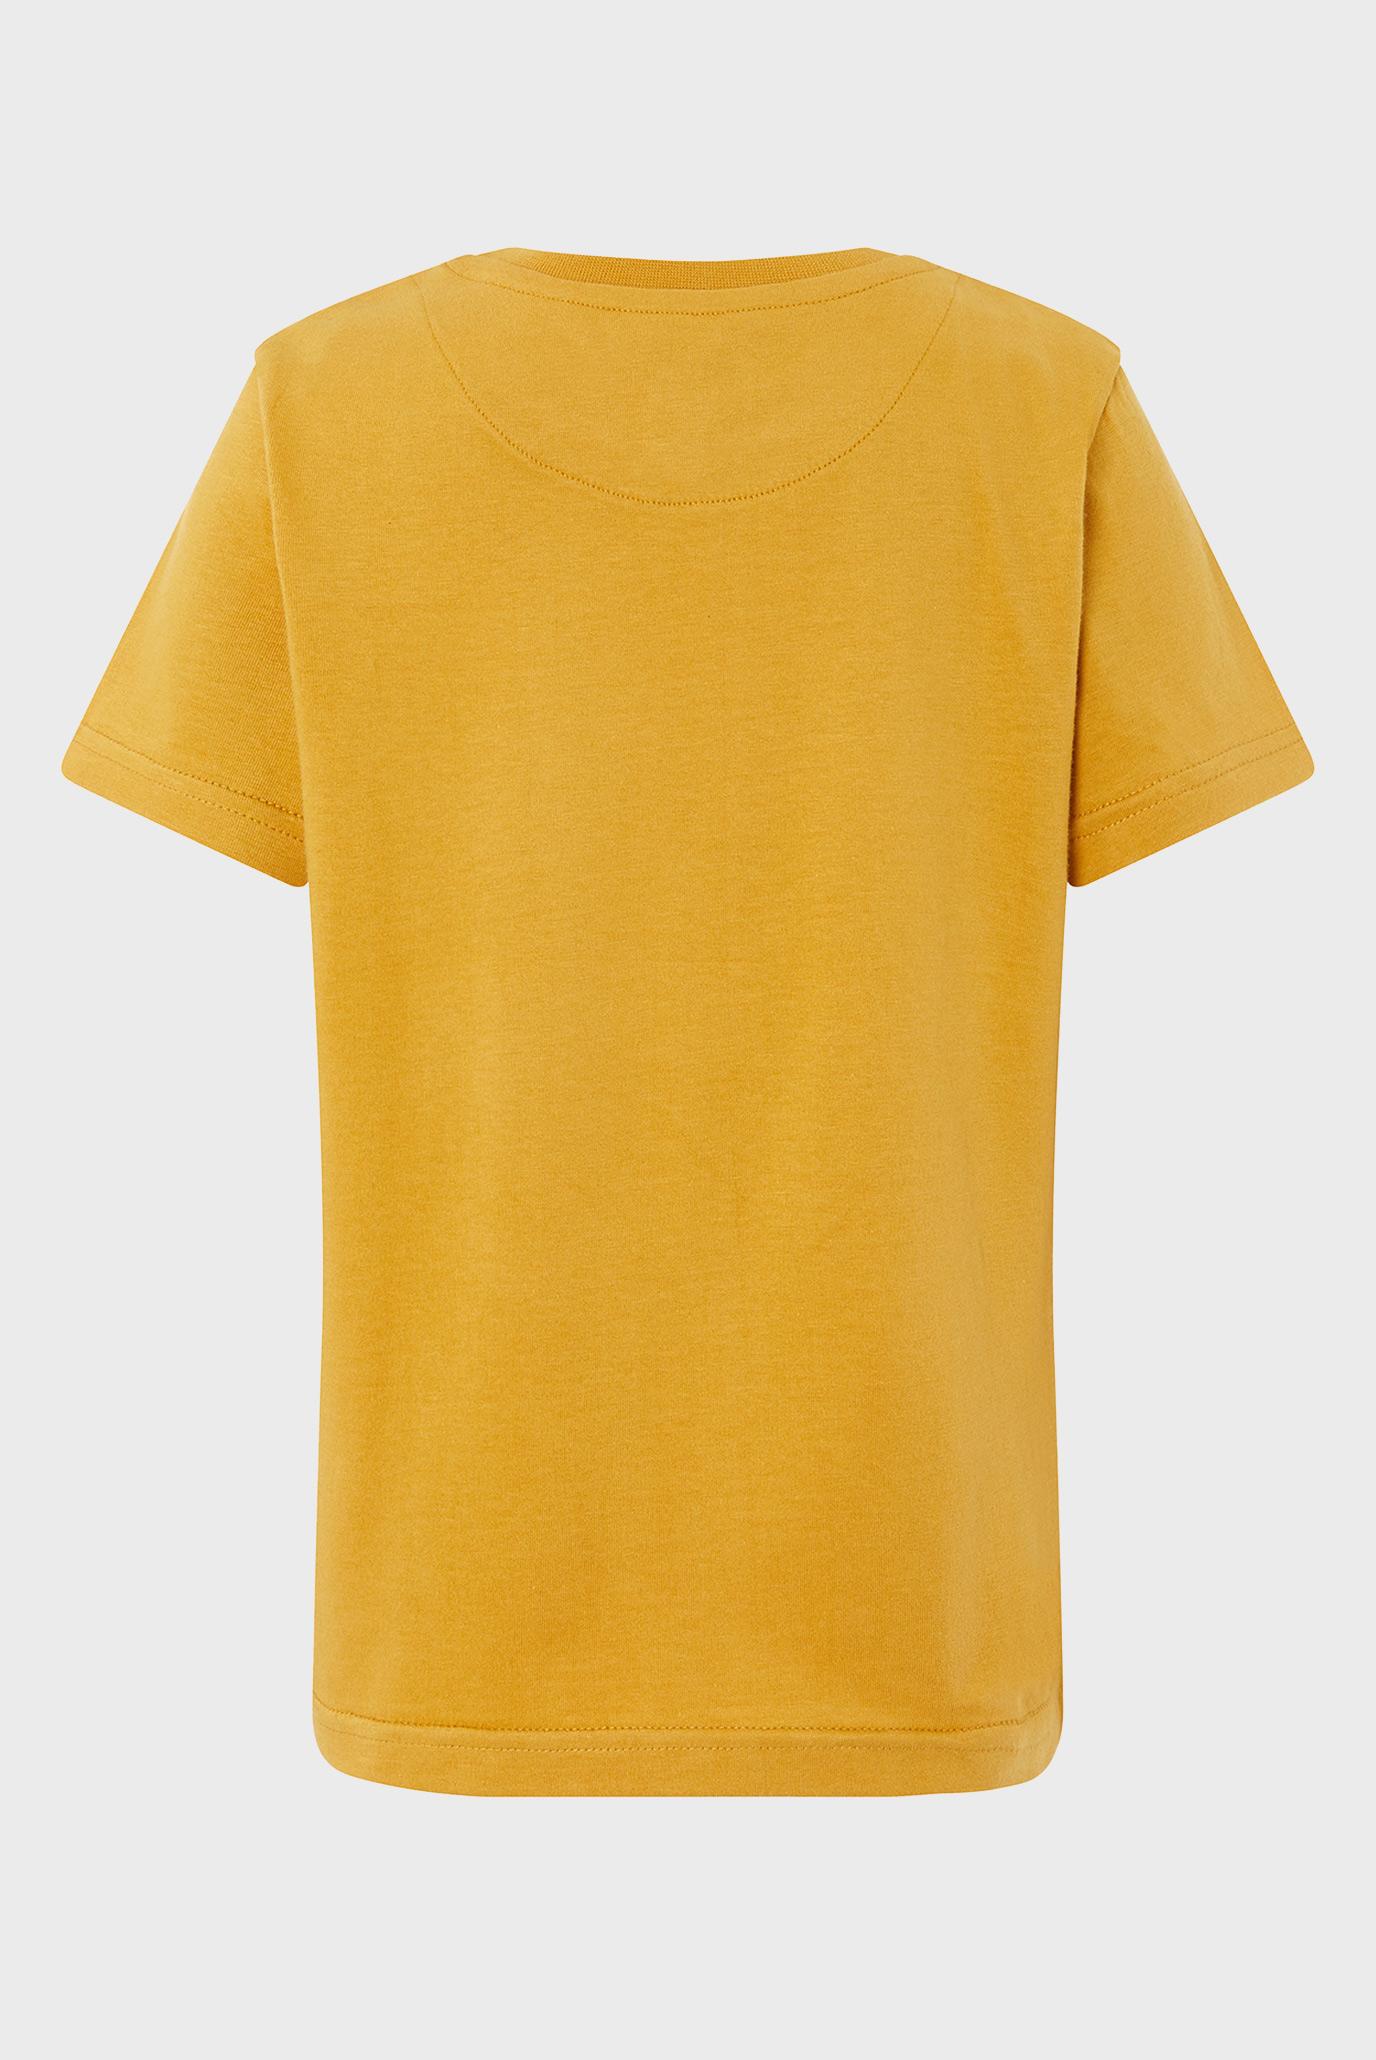 Купить Детская желтая футболка Digbee Giraffe Tee Monsoon Children Monsoon Children 616687 – Киев, Украина. Цены в интернет магазине MD Fashion